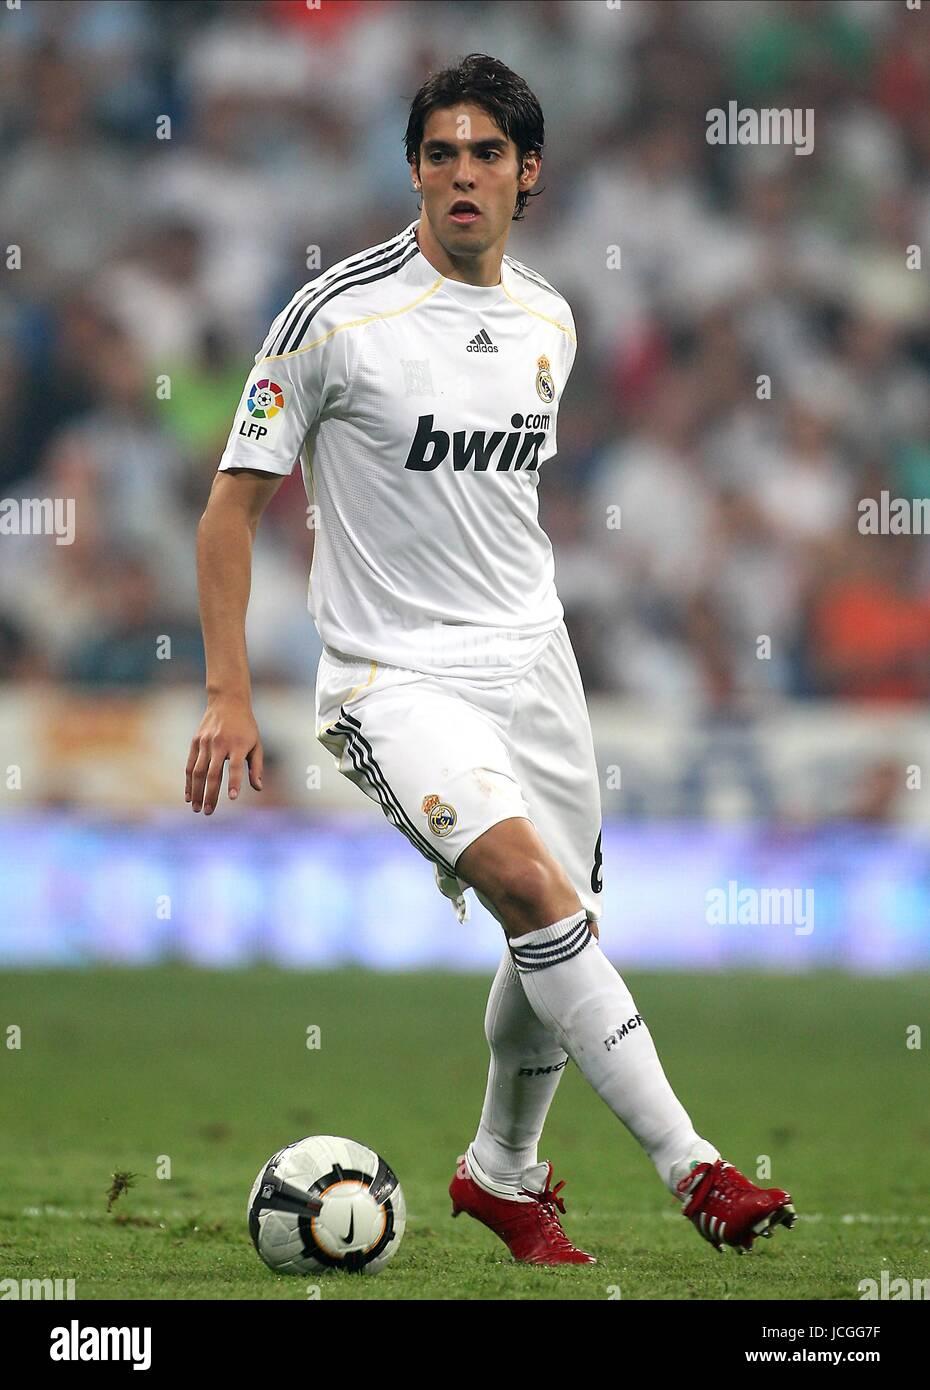 Kaka Real Madrid High Resolution Stock Photography and Images   Alamy